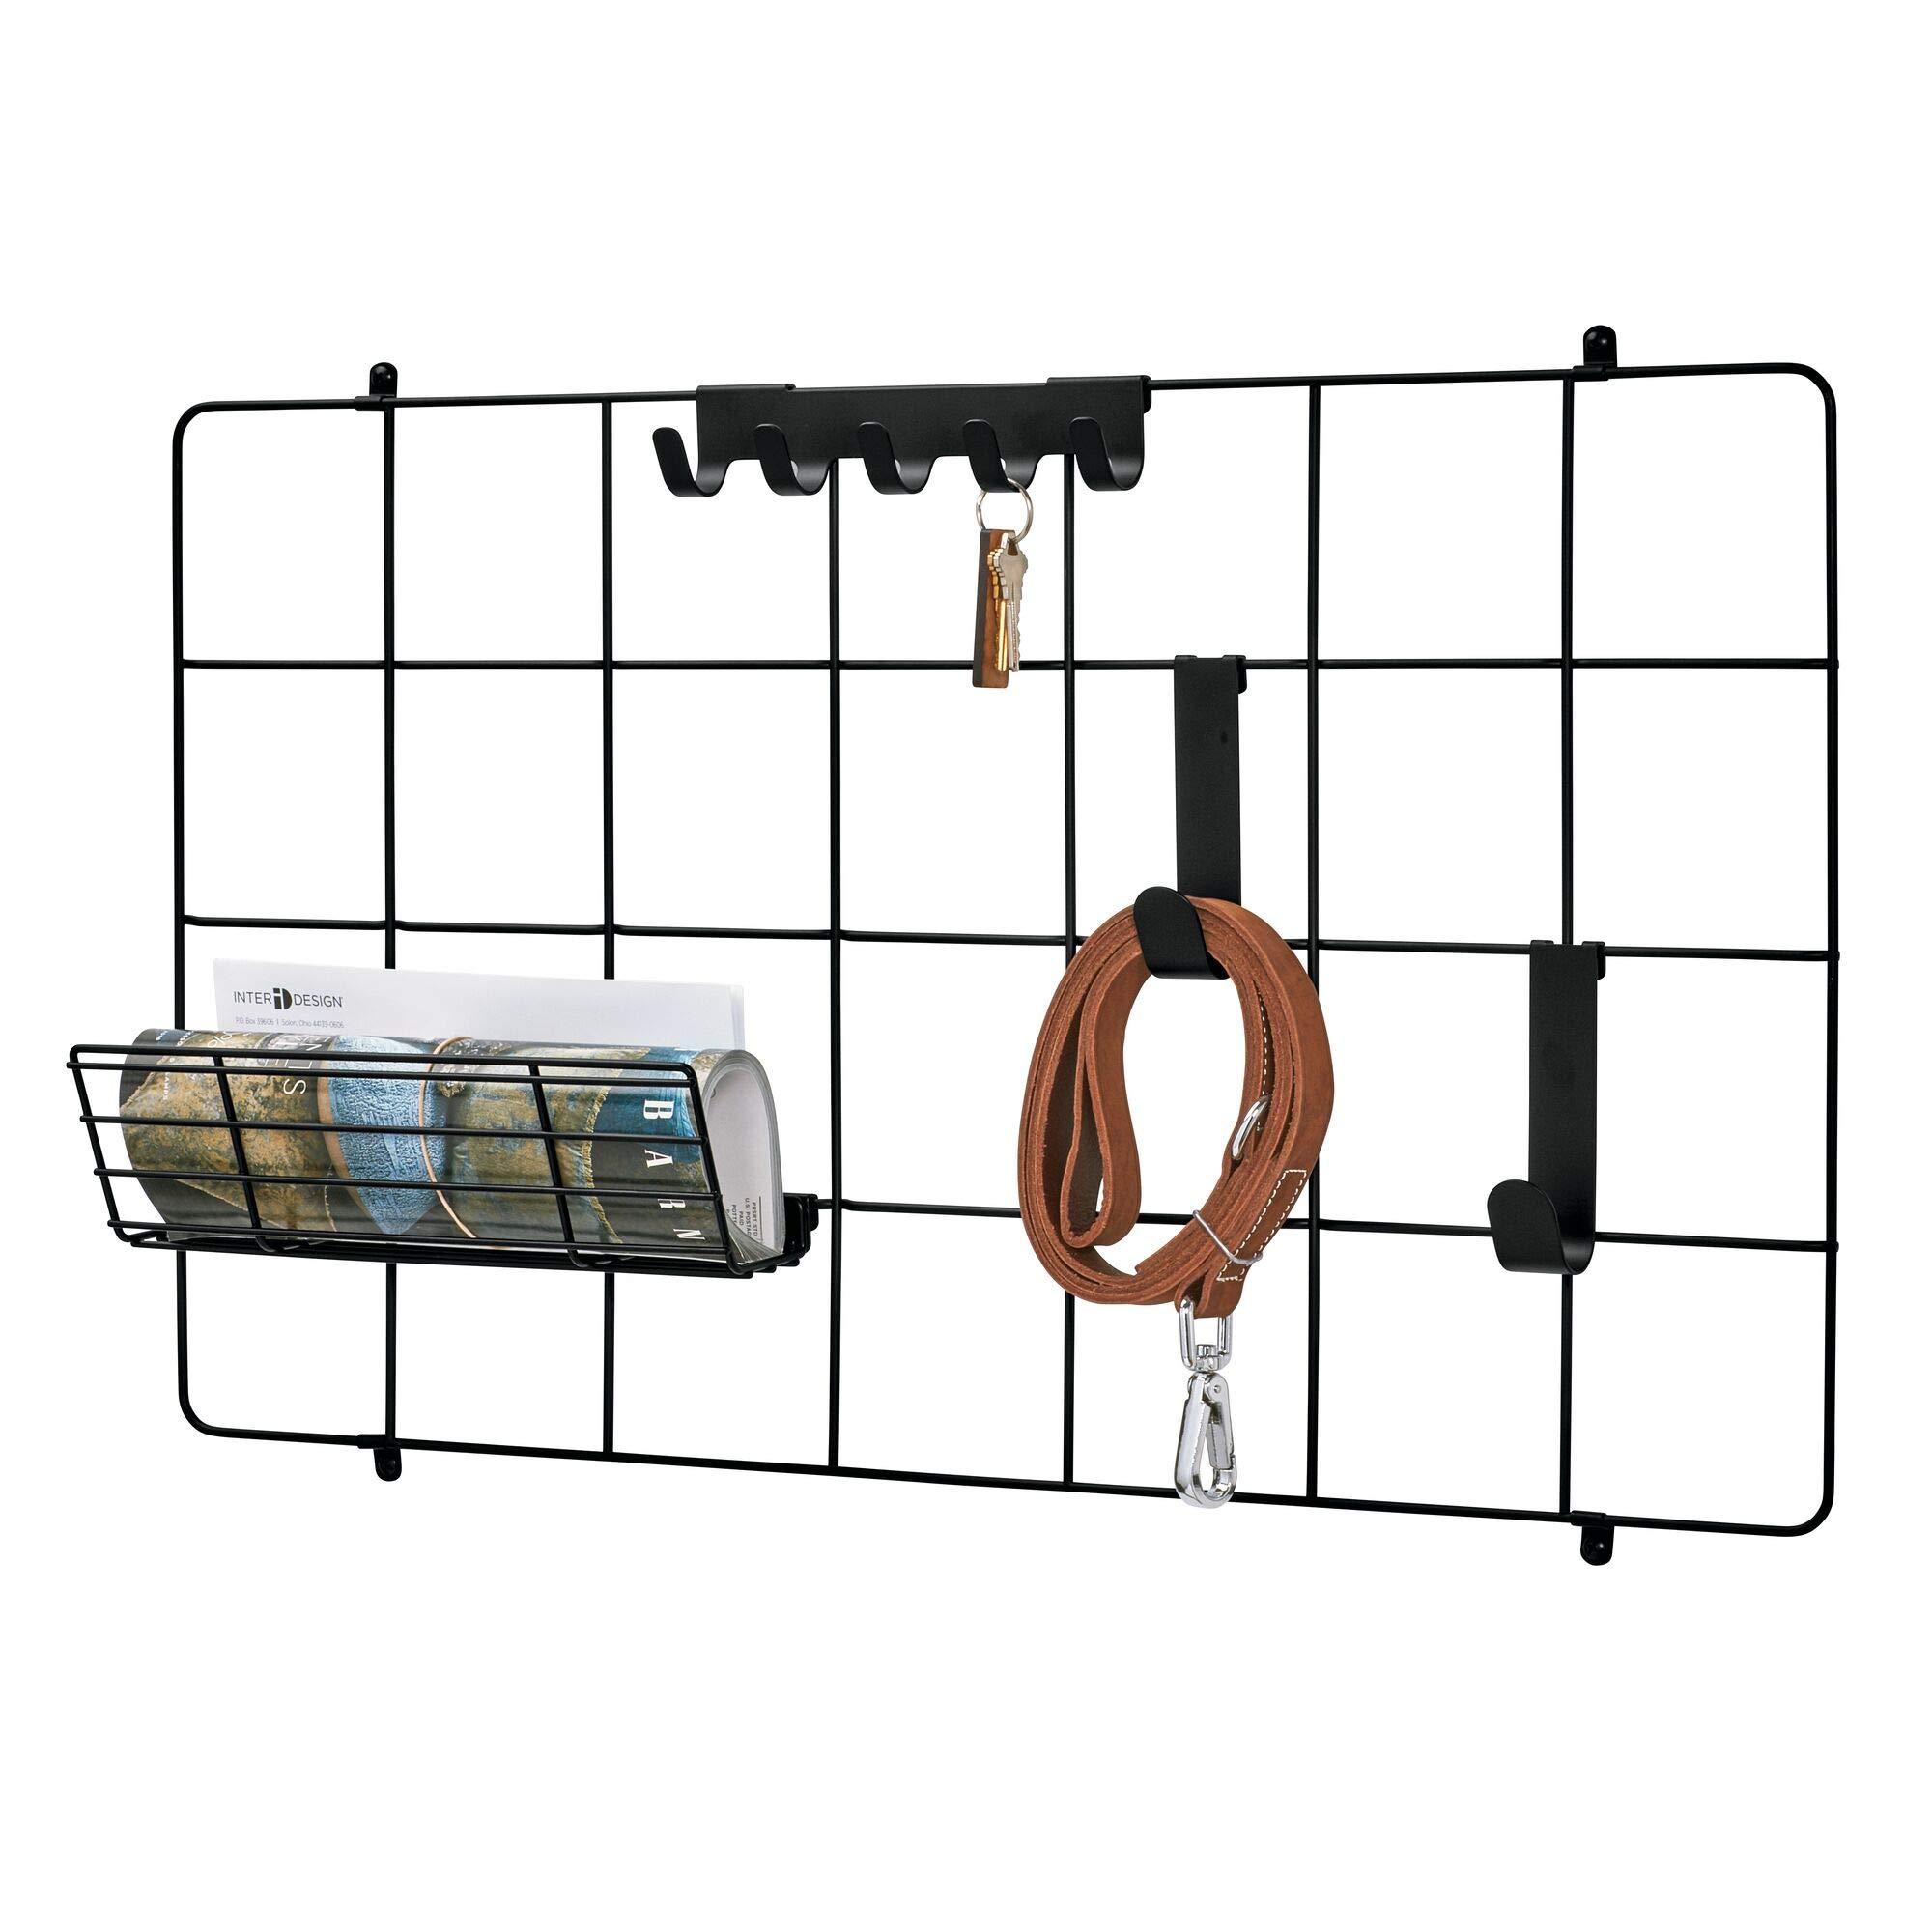 iDesign Jayce Metal Wall System, Modular Grid Organizational Panel for Additional Storage in Kitchen, Bathroom, Office, Craft Room, Garage, Basement, Matte Black